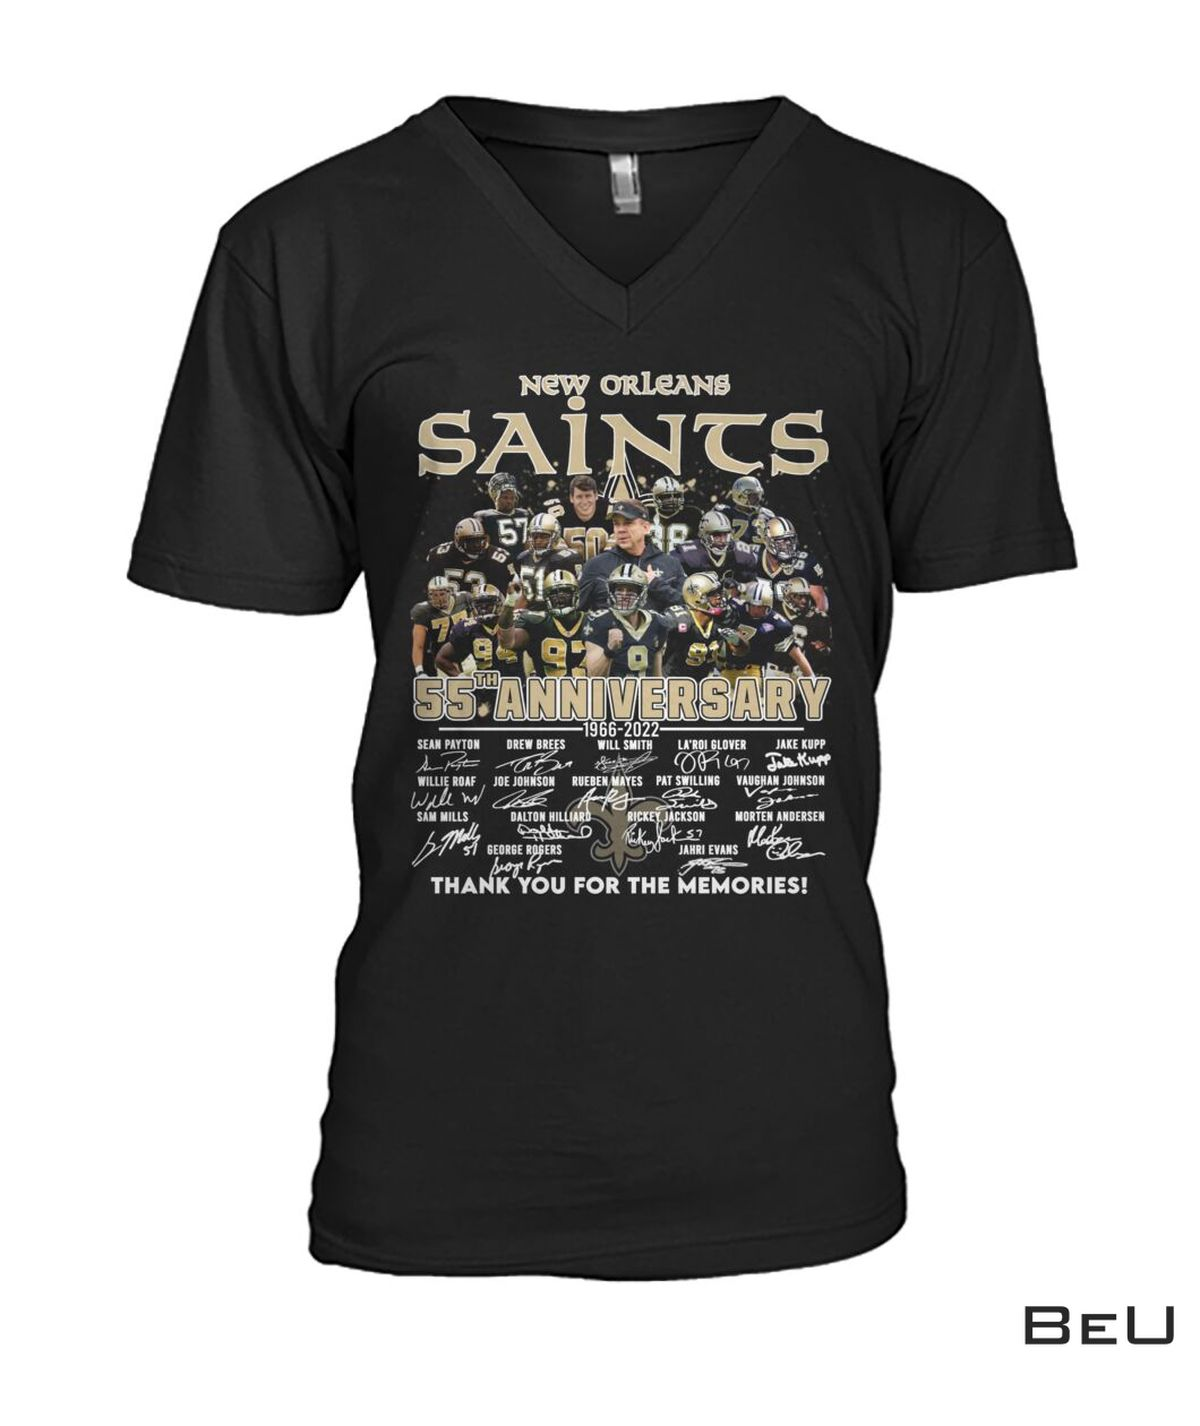 New Orleans Saints 55th Anniversary Shirt c